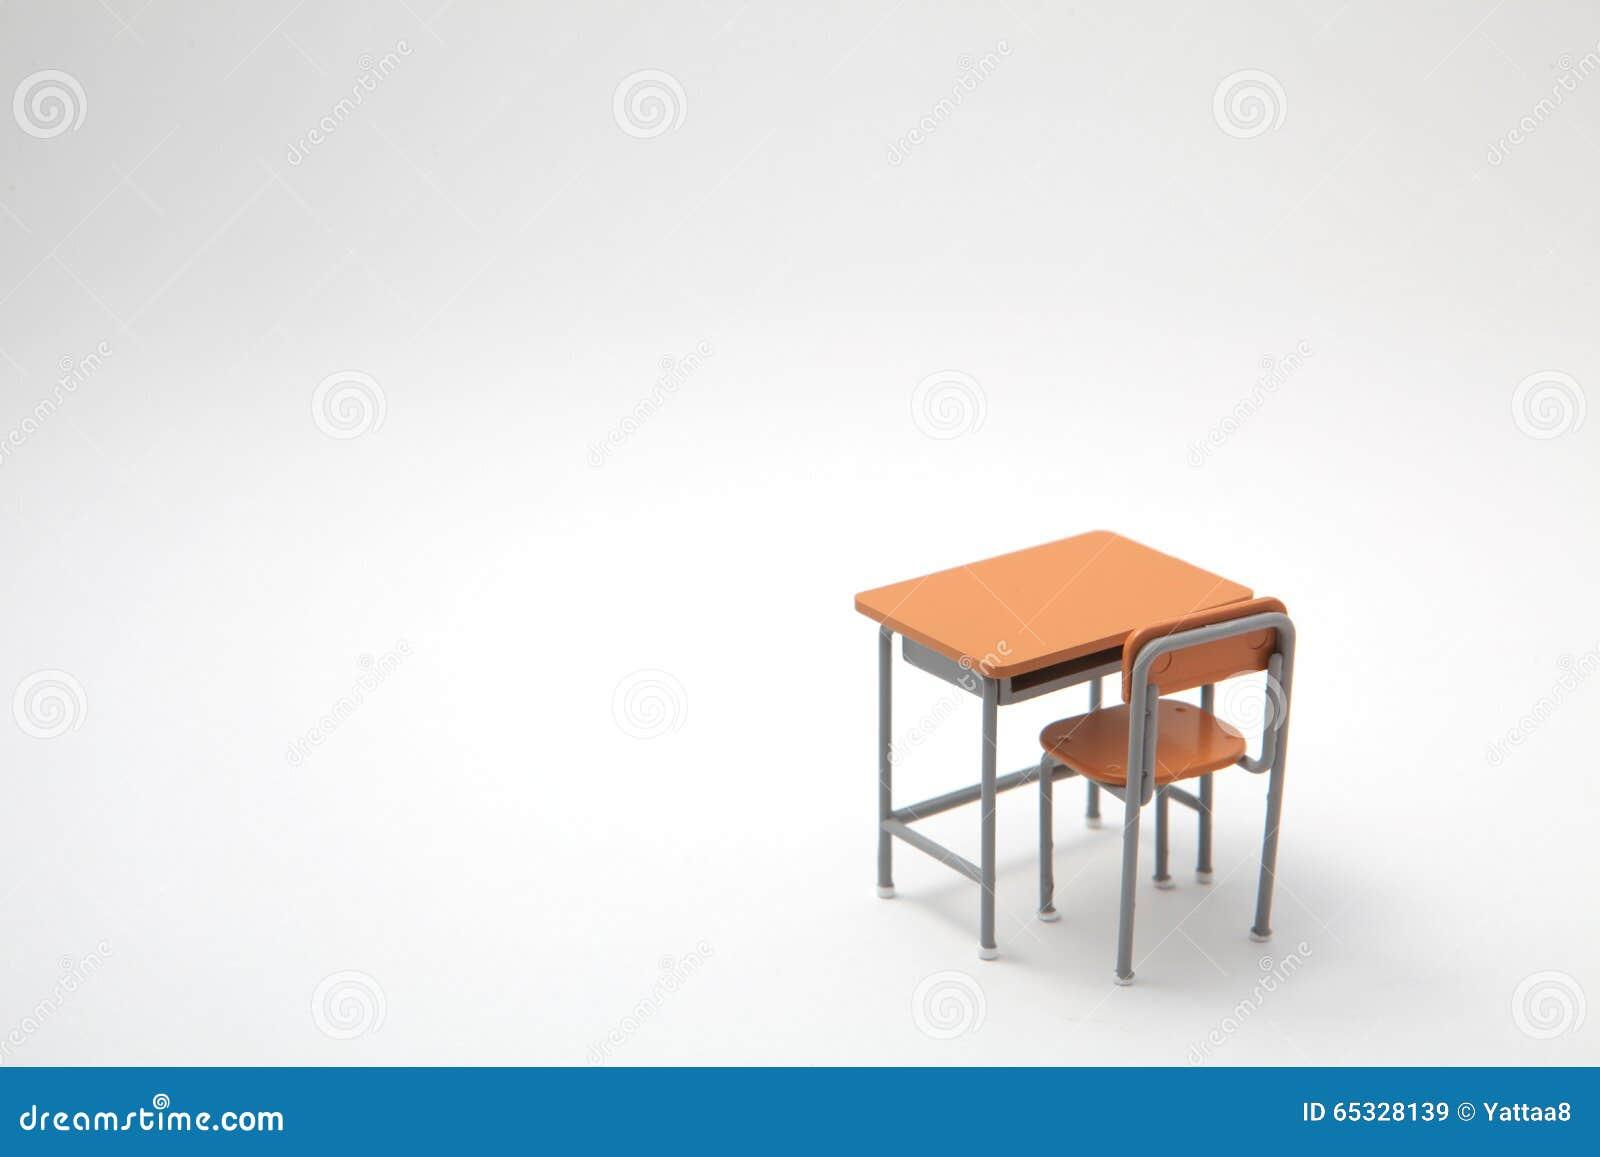 Escritorio de aprendizaje miniatura